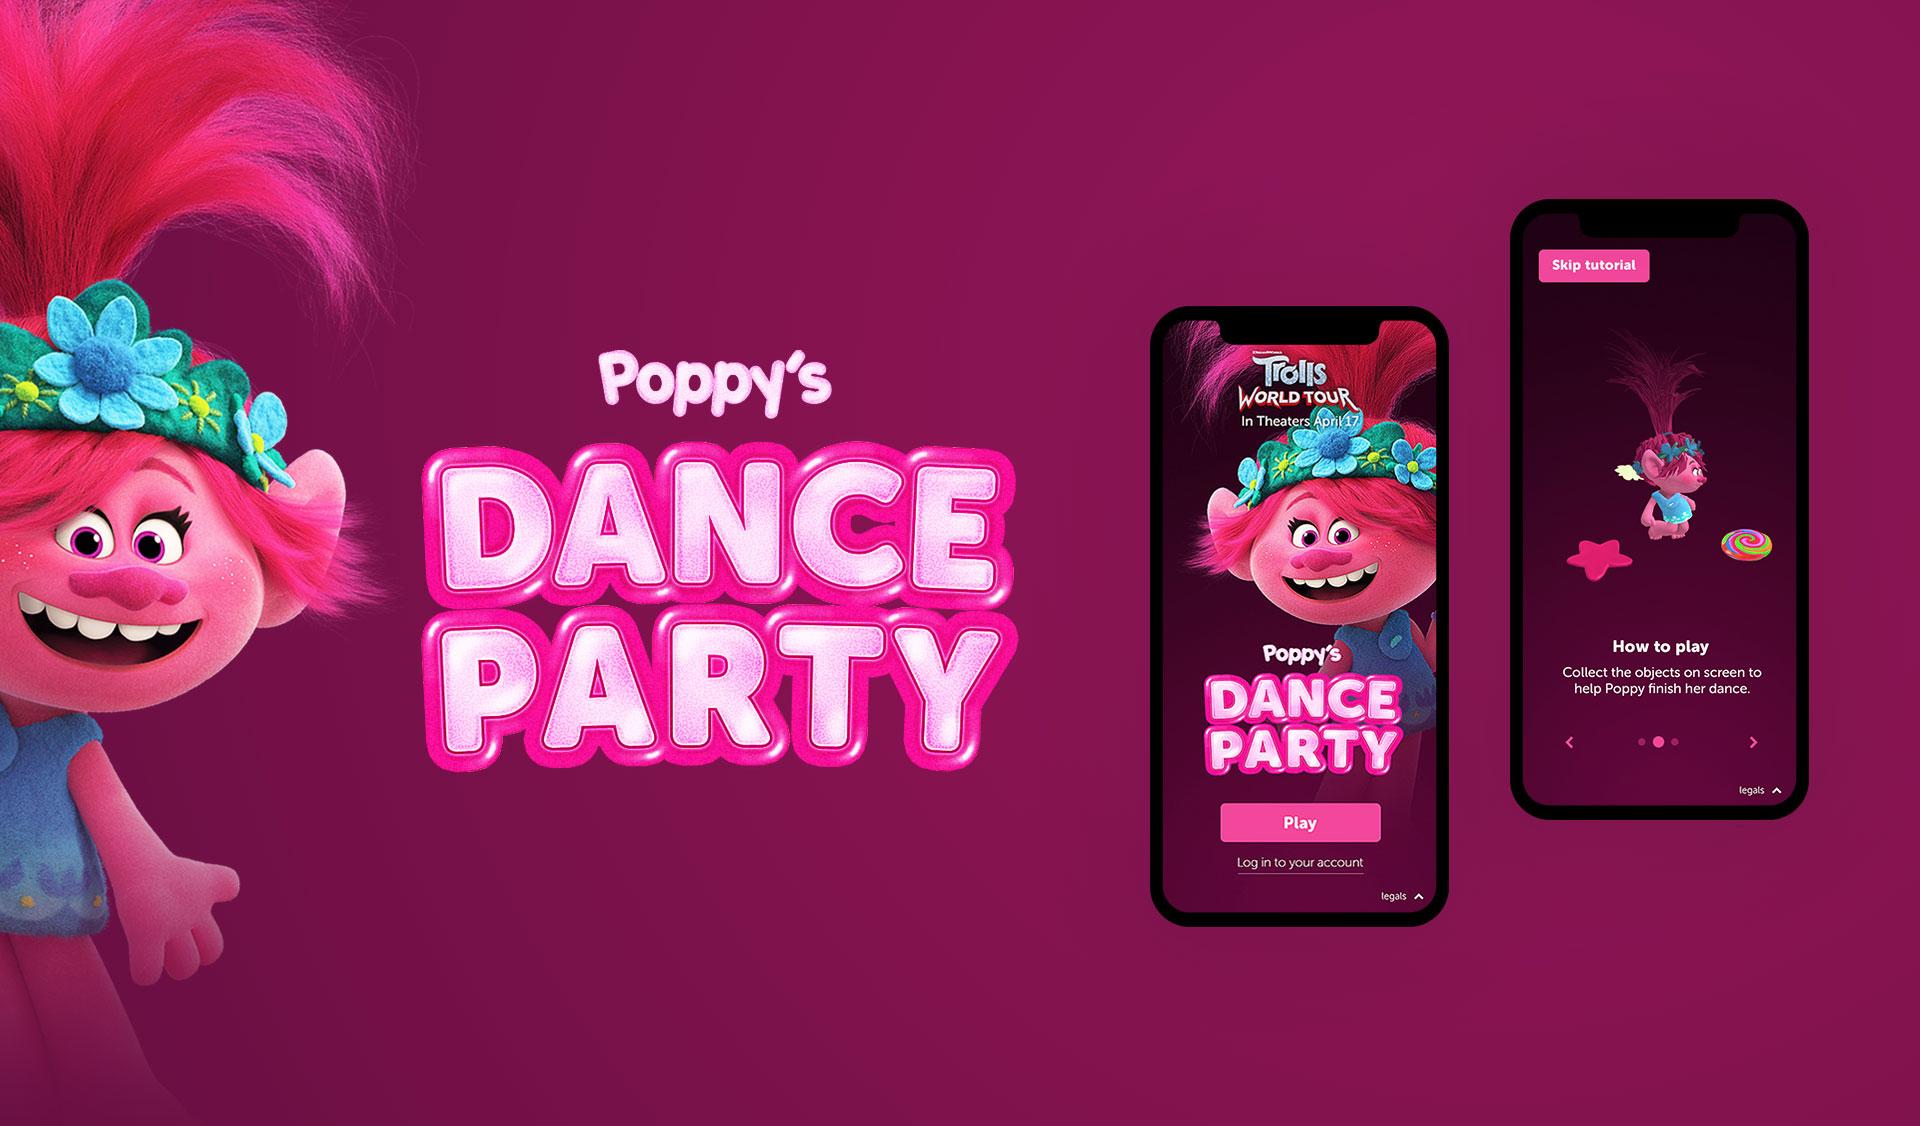 Poppy title design and branding